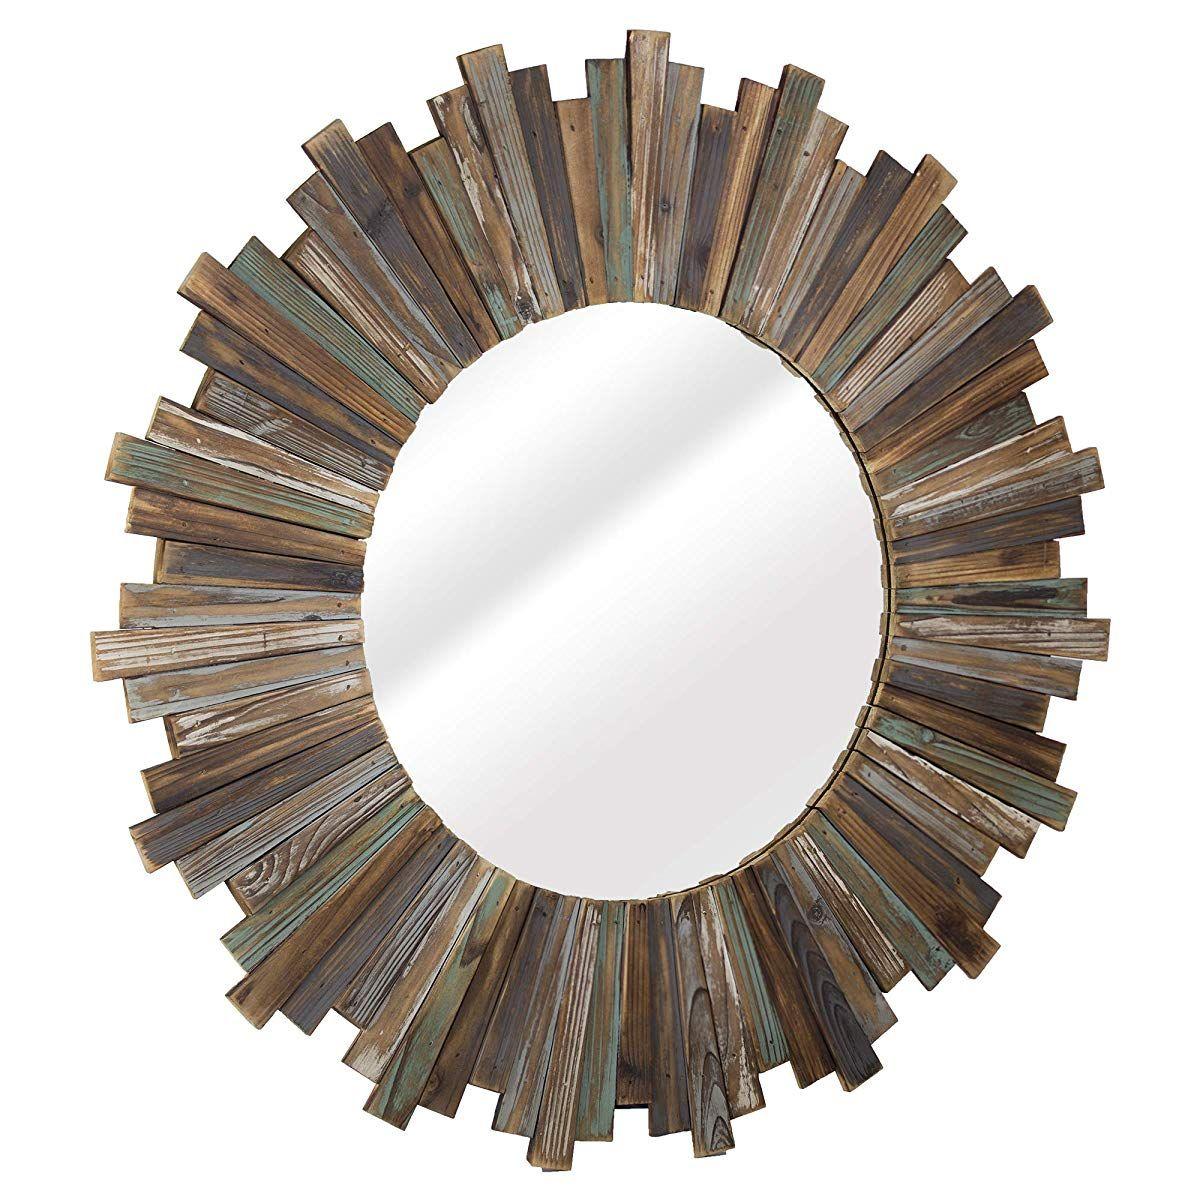 Distressed Wood 36 Round Sunburst Wall Vanity Accent Mirror